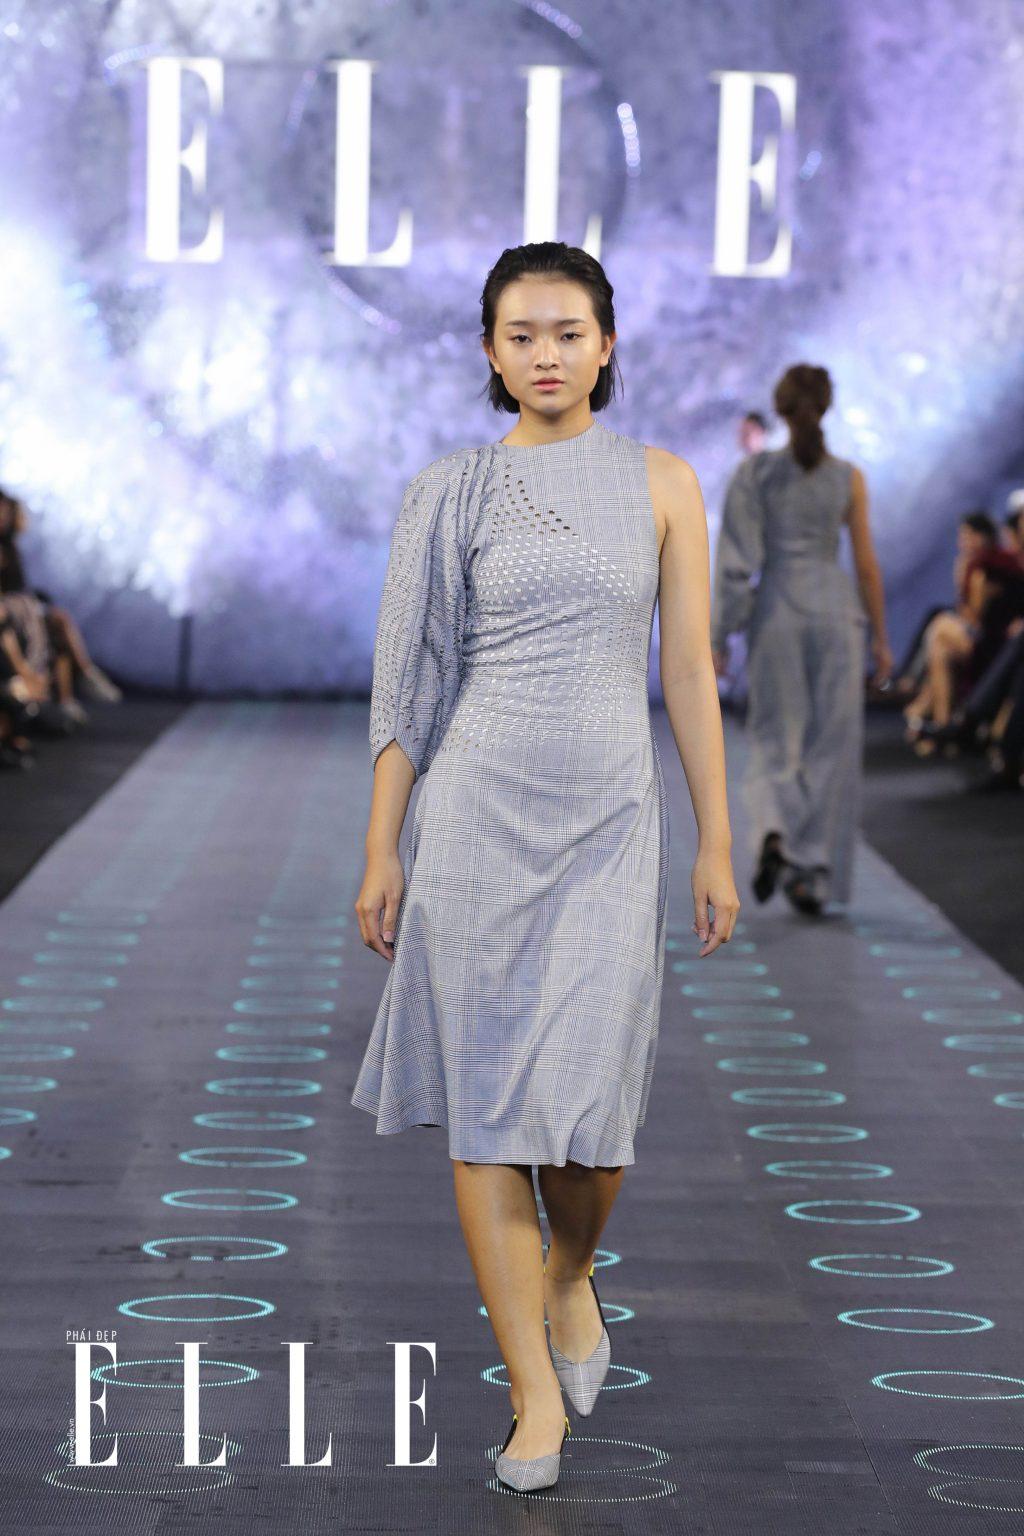 bst vinn pantararin elle fashion journey 2018 4